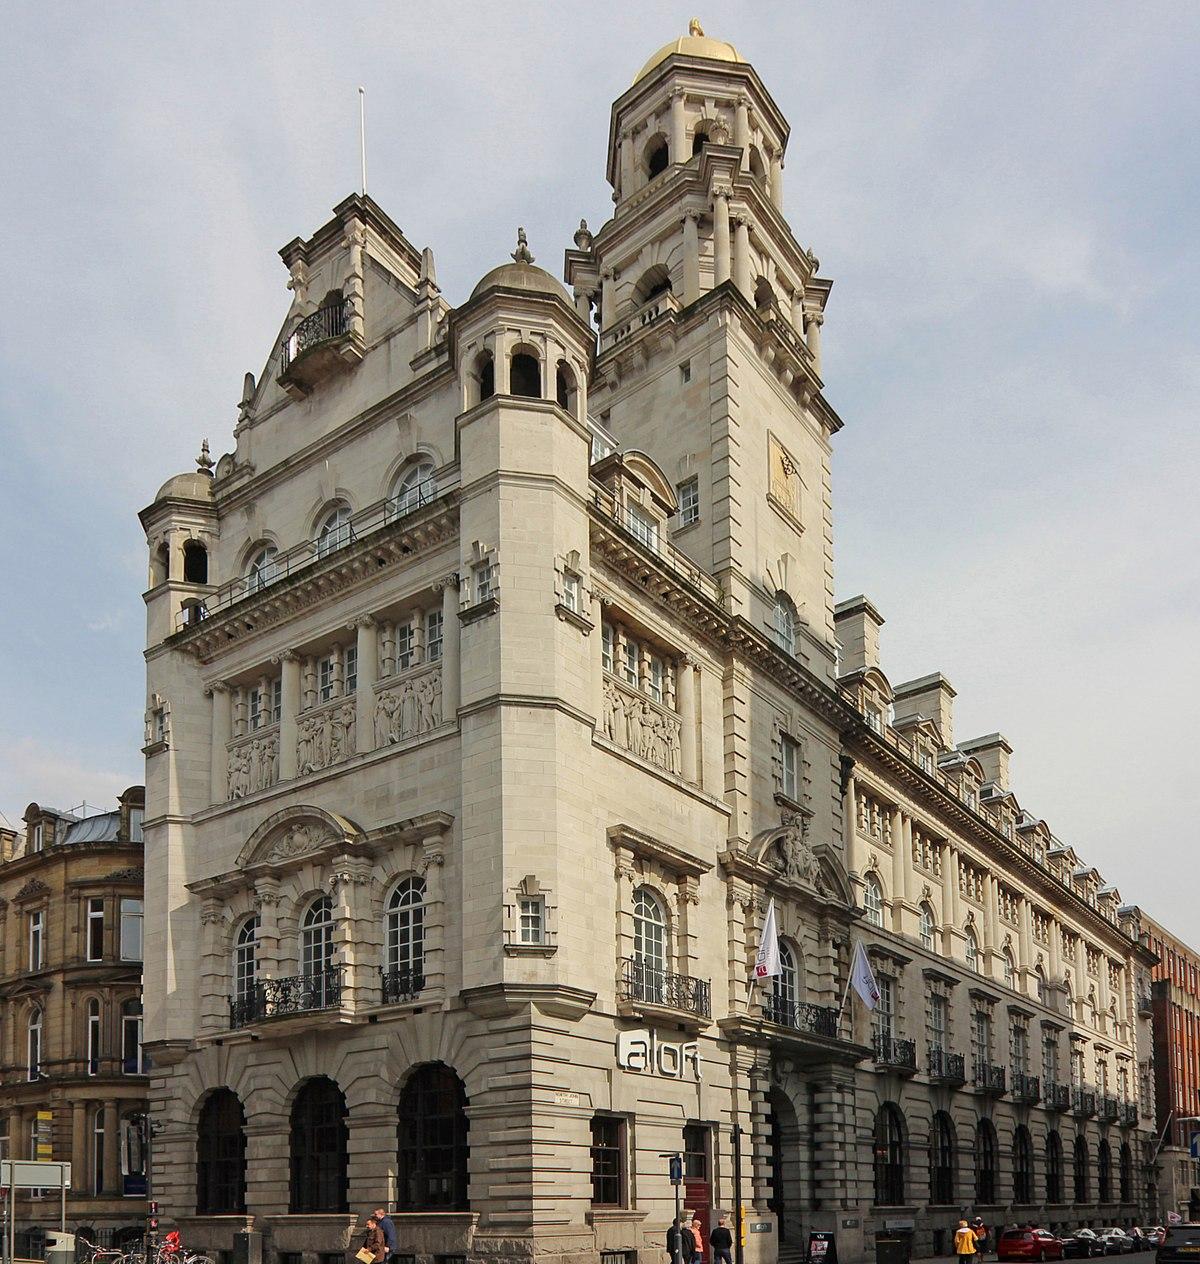 Building A Backyard Gym: Royal Insurance Building, Liverpool